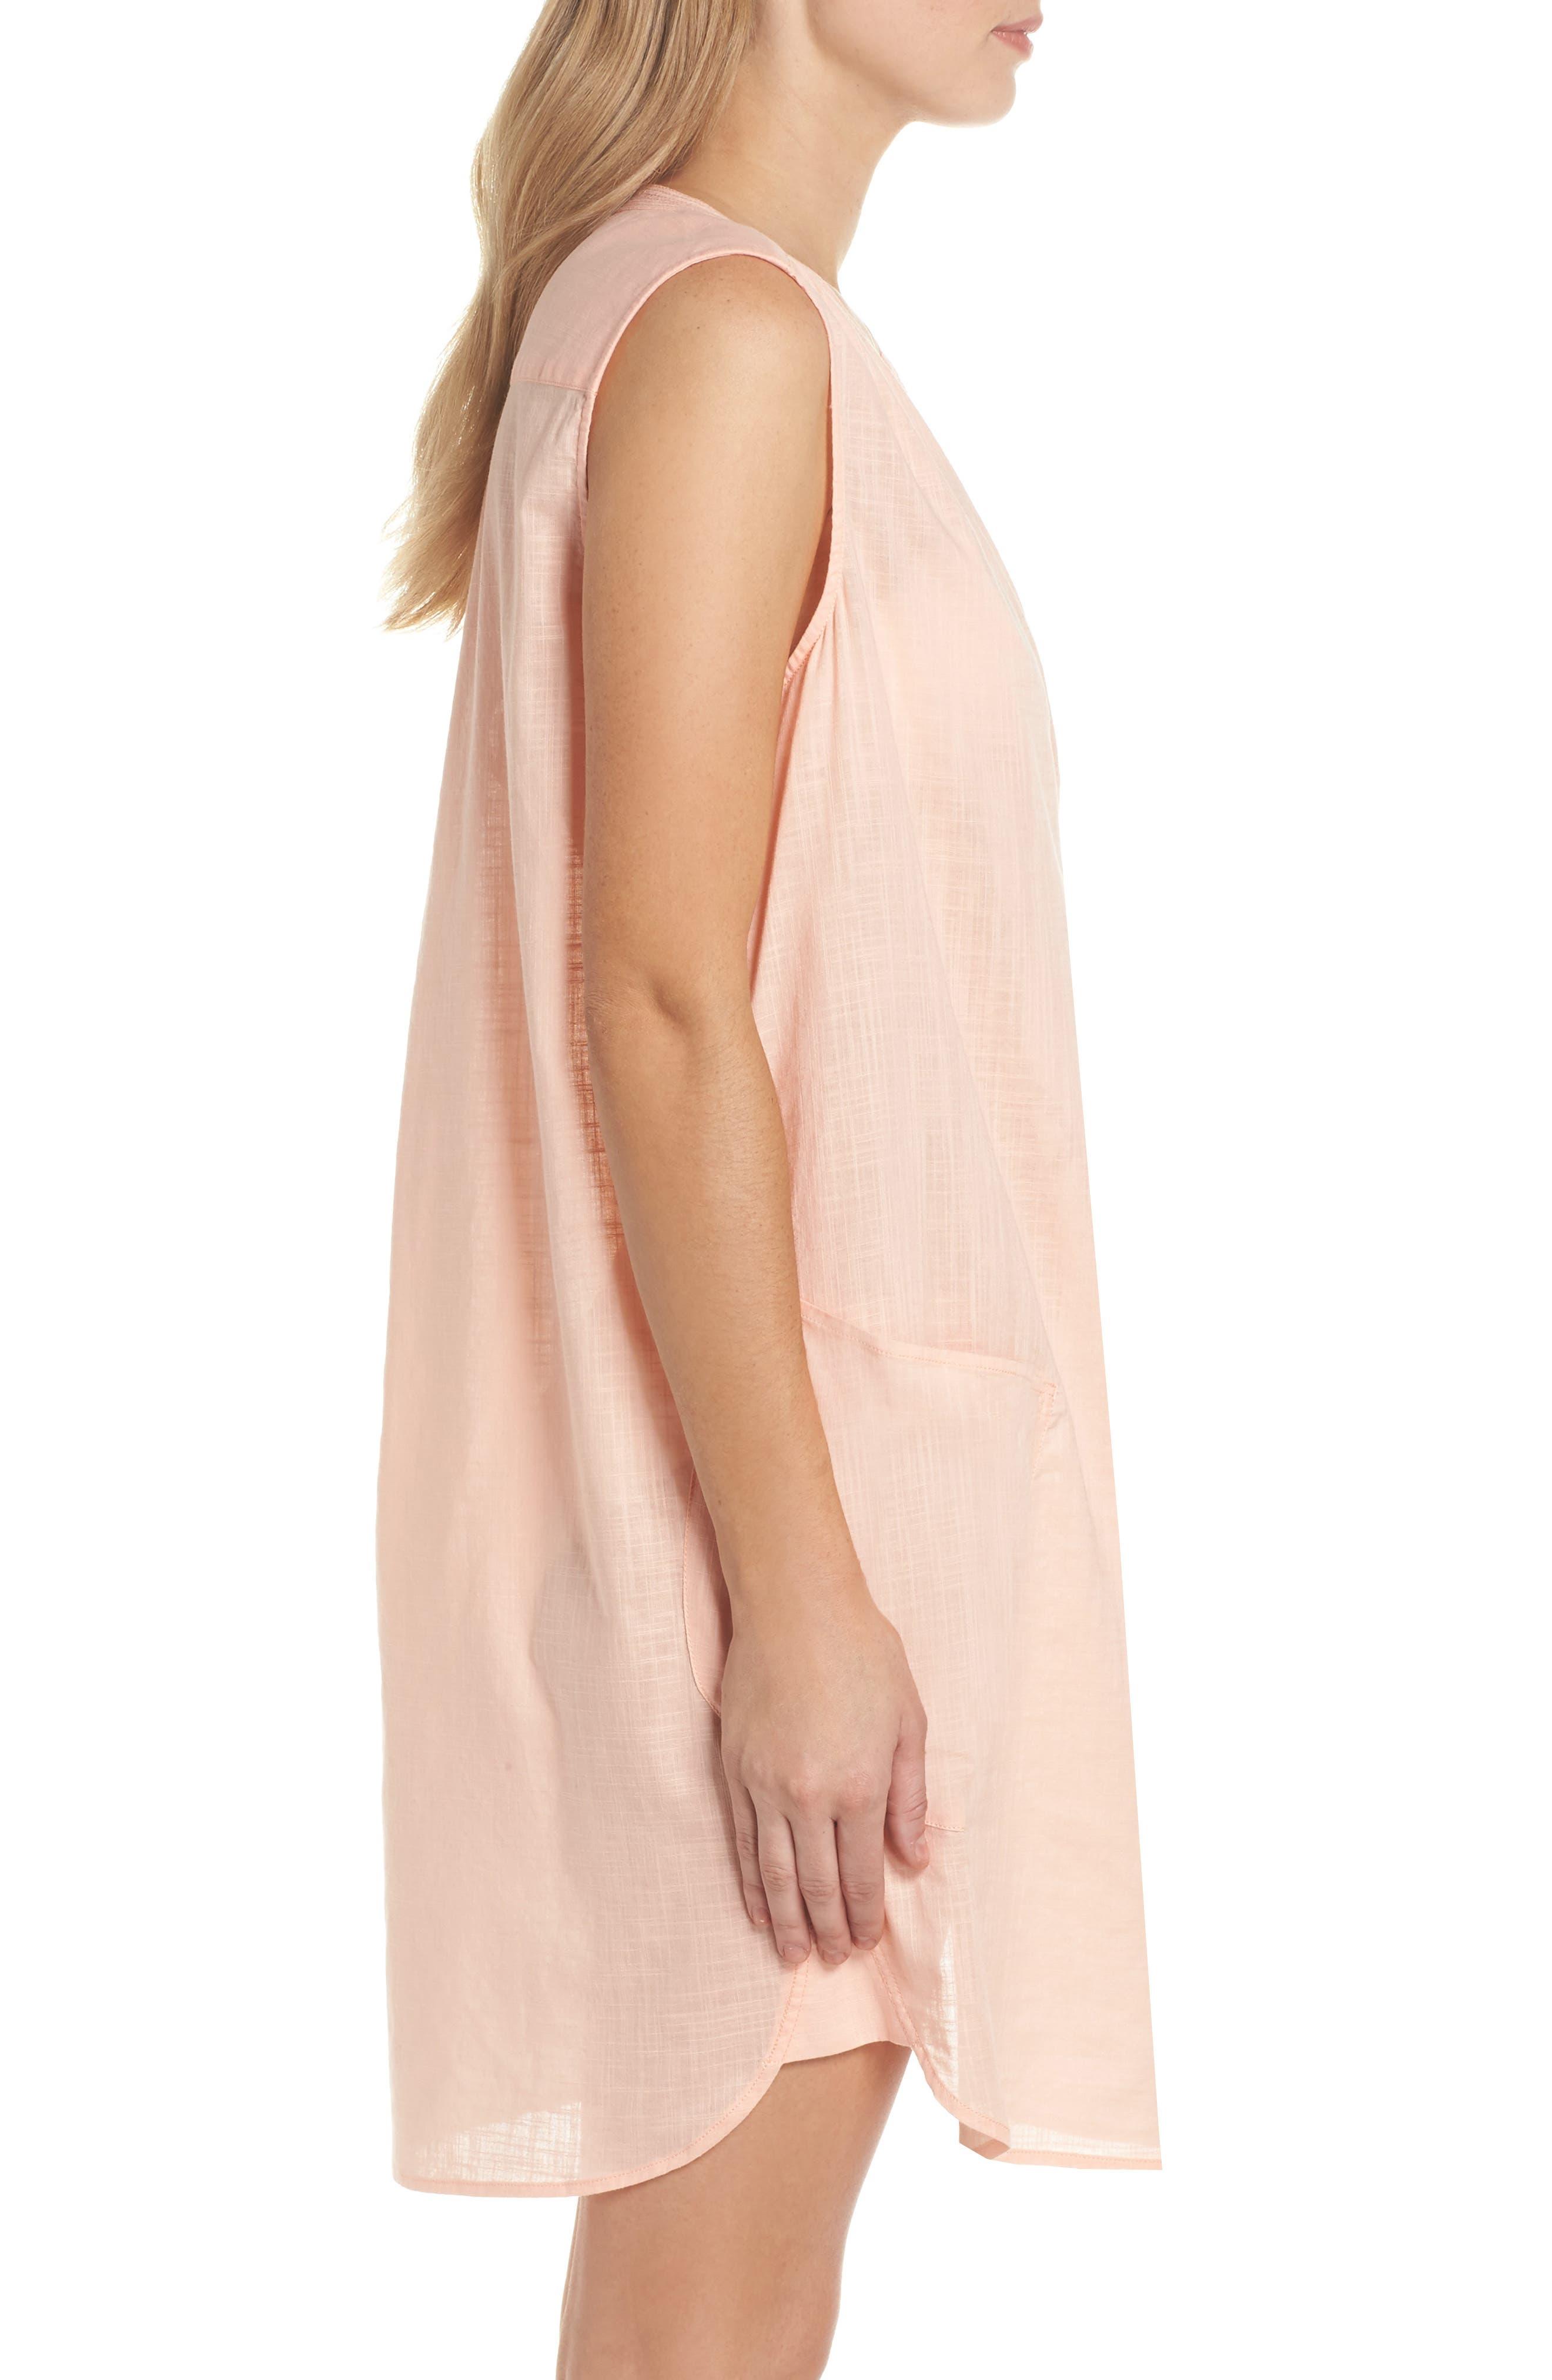 Palm Beach Cover-Up Dress,                             Alternate thumbnail 3, color,                             Peach Melba